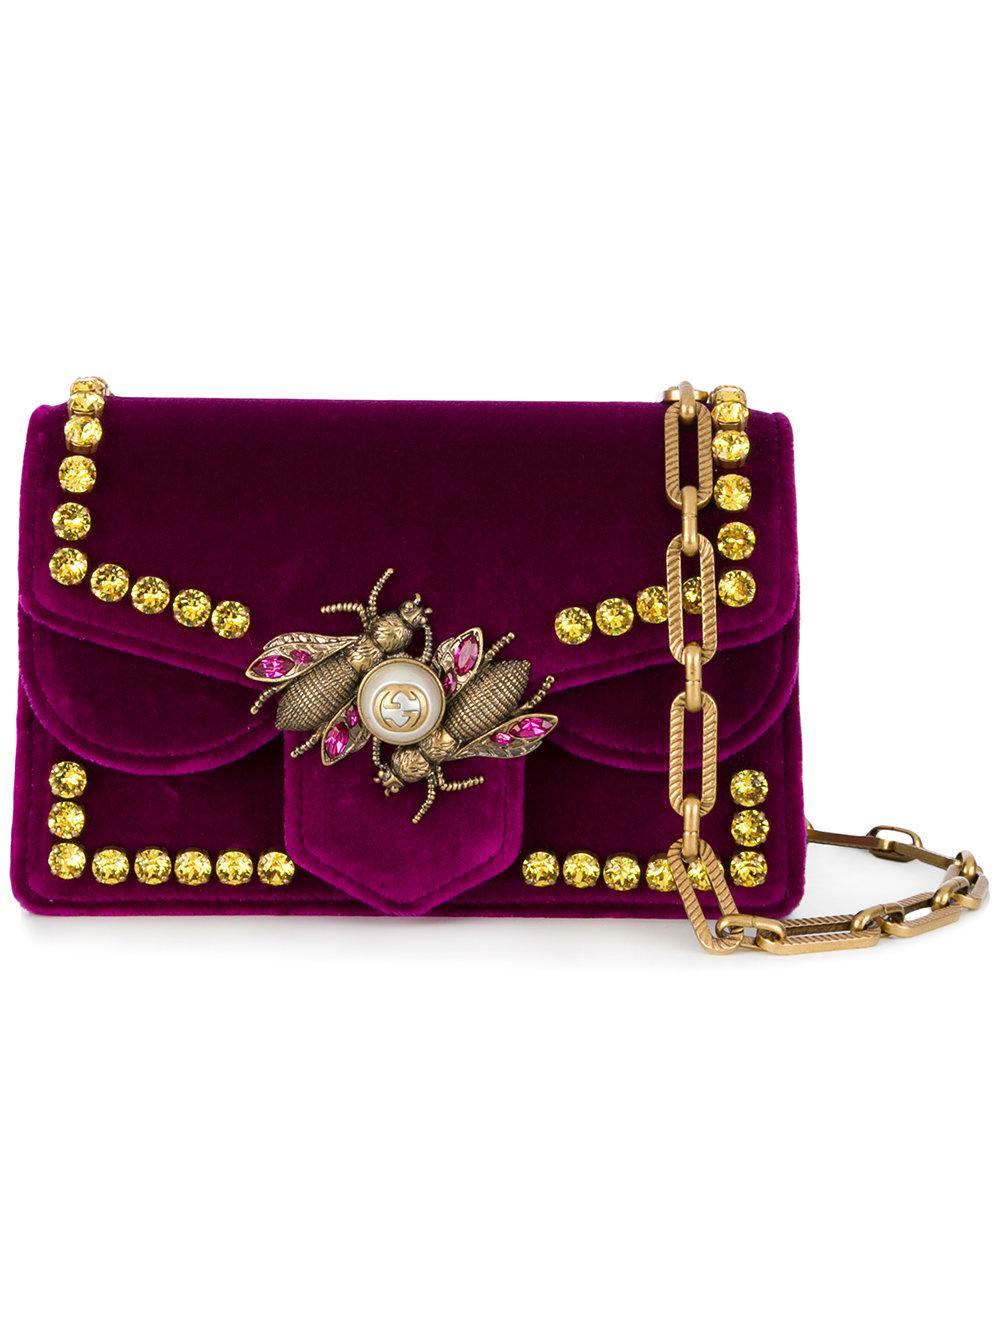 0f9e55dc5185 Gucci Bee Velvet Shoulder Bag In Pink & Purple | ModeSens